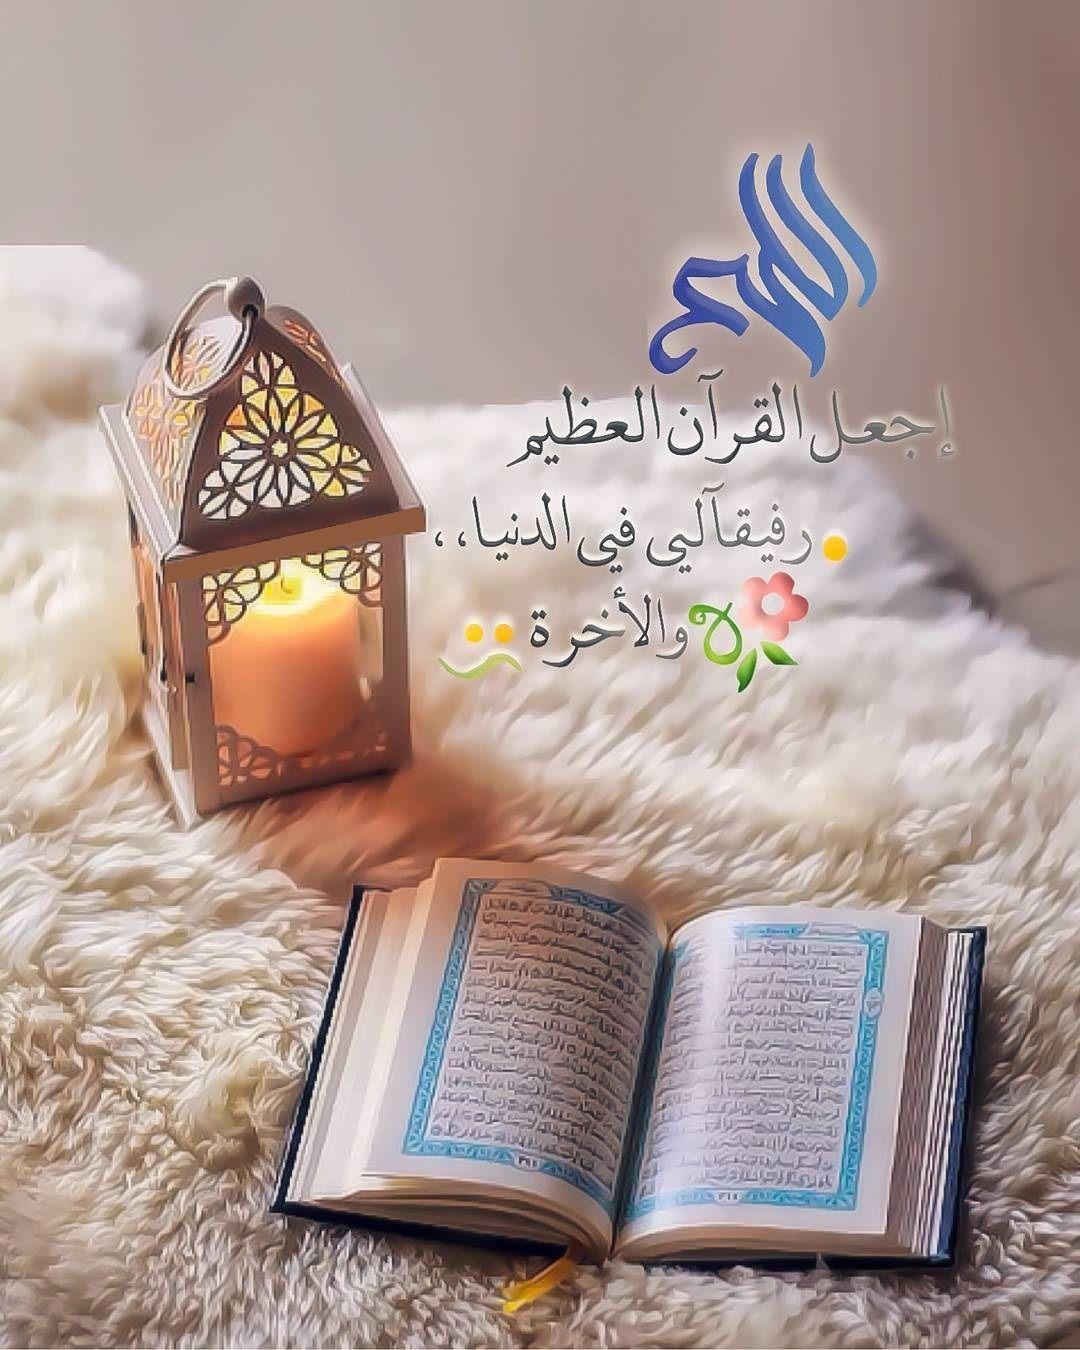 Pin By Imene Melizi On أدعـيـــــــ ـ ـ ـ ـ ـ ـ ــــــة Islamic Information Noble Quran Islamic Pictures